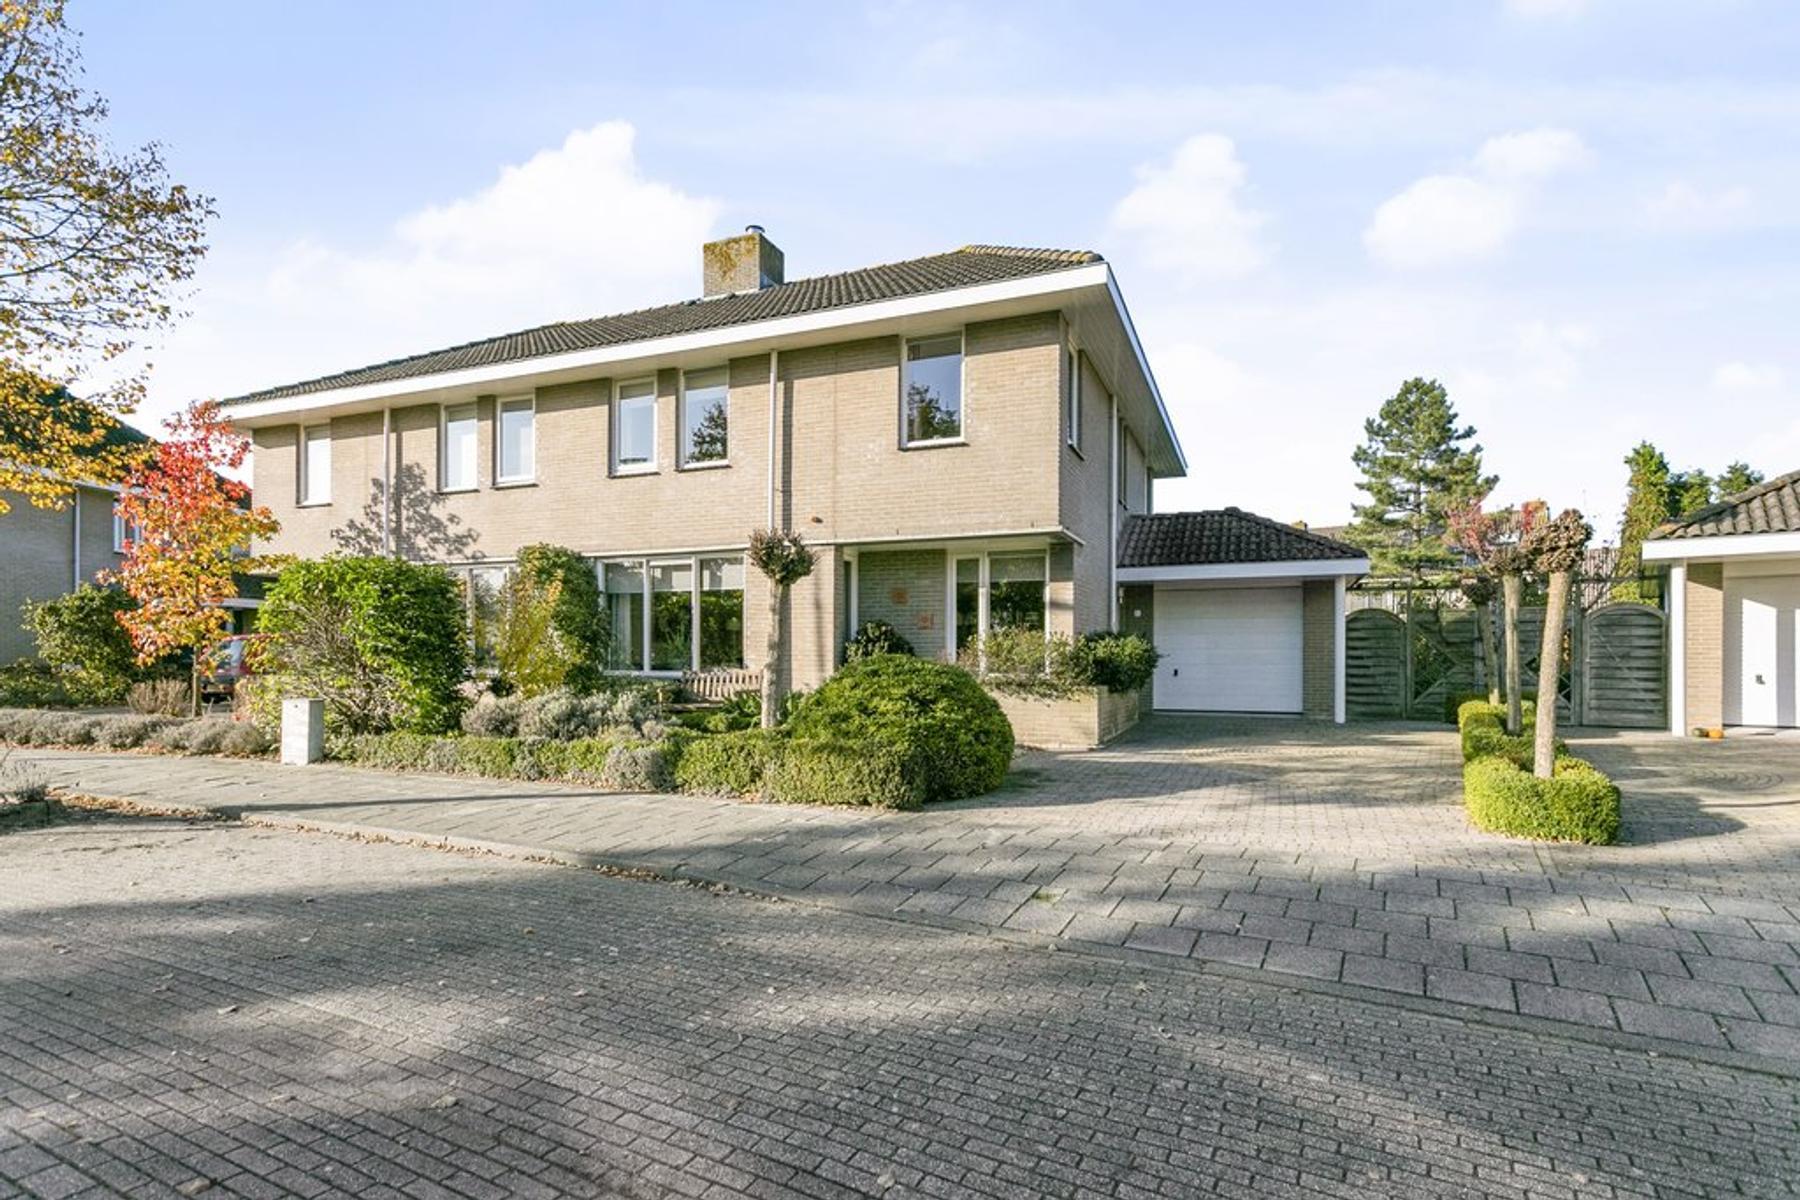 H. Roland Holstlaan 40 in Vlissingen 4385 KJ